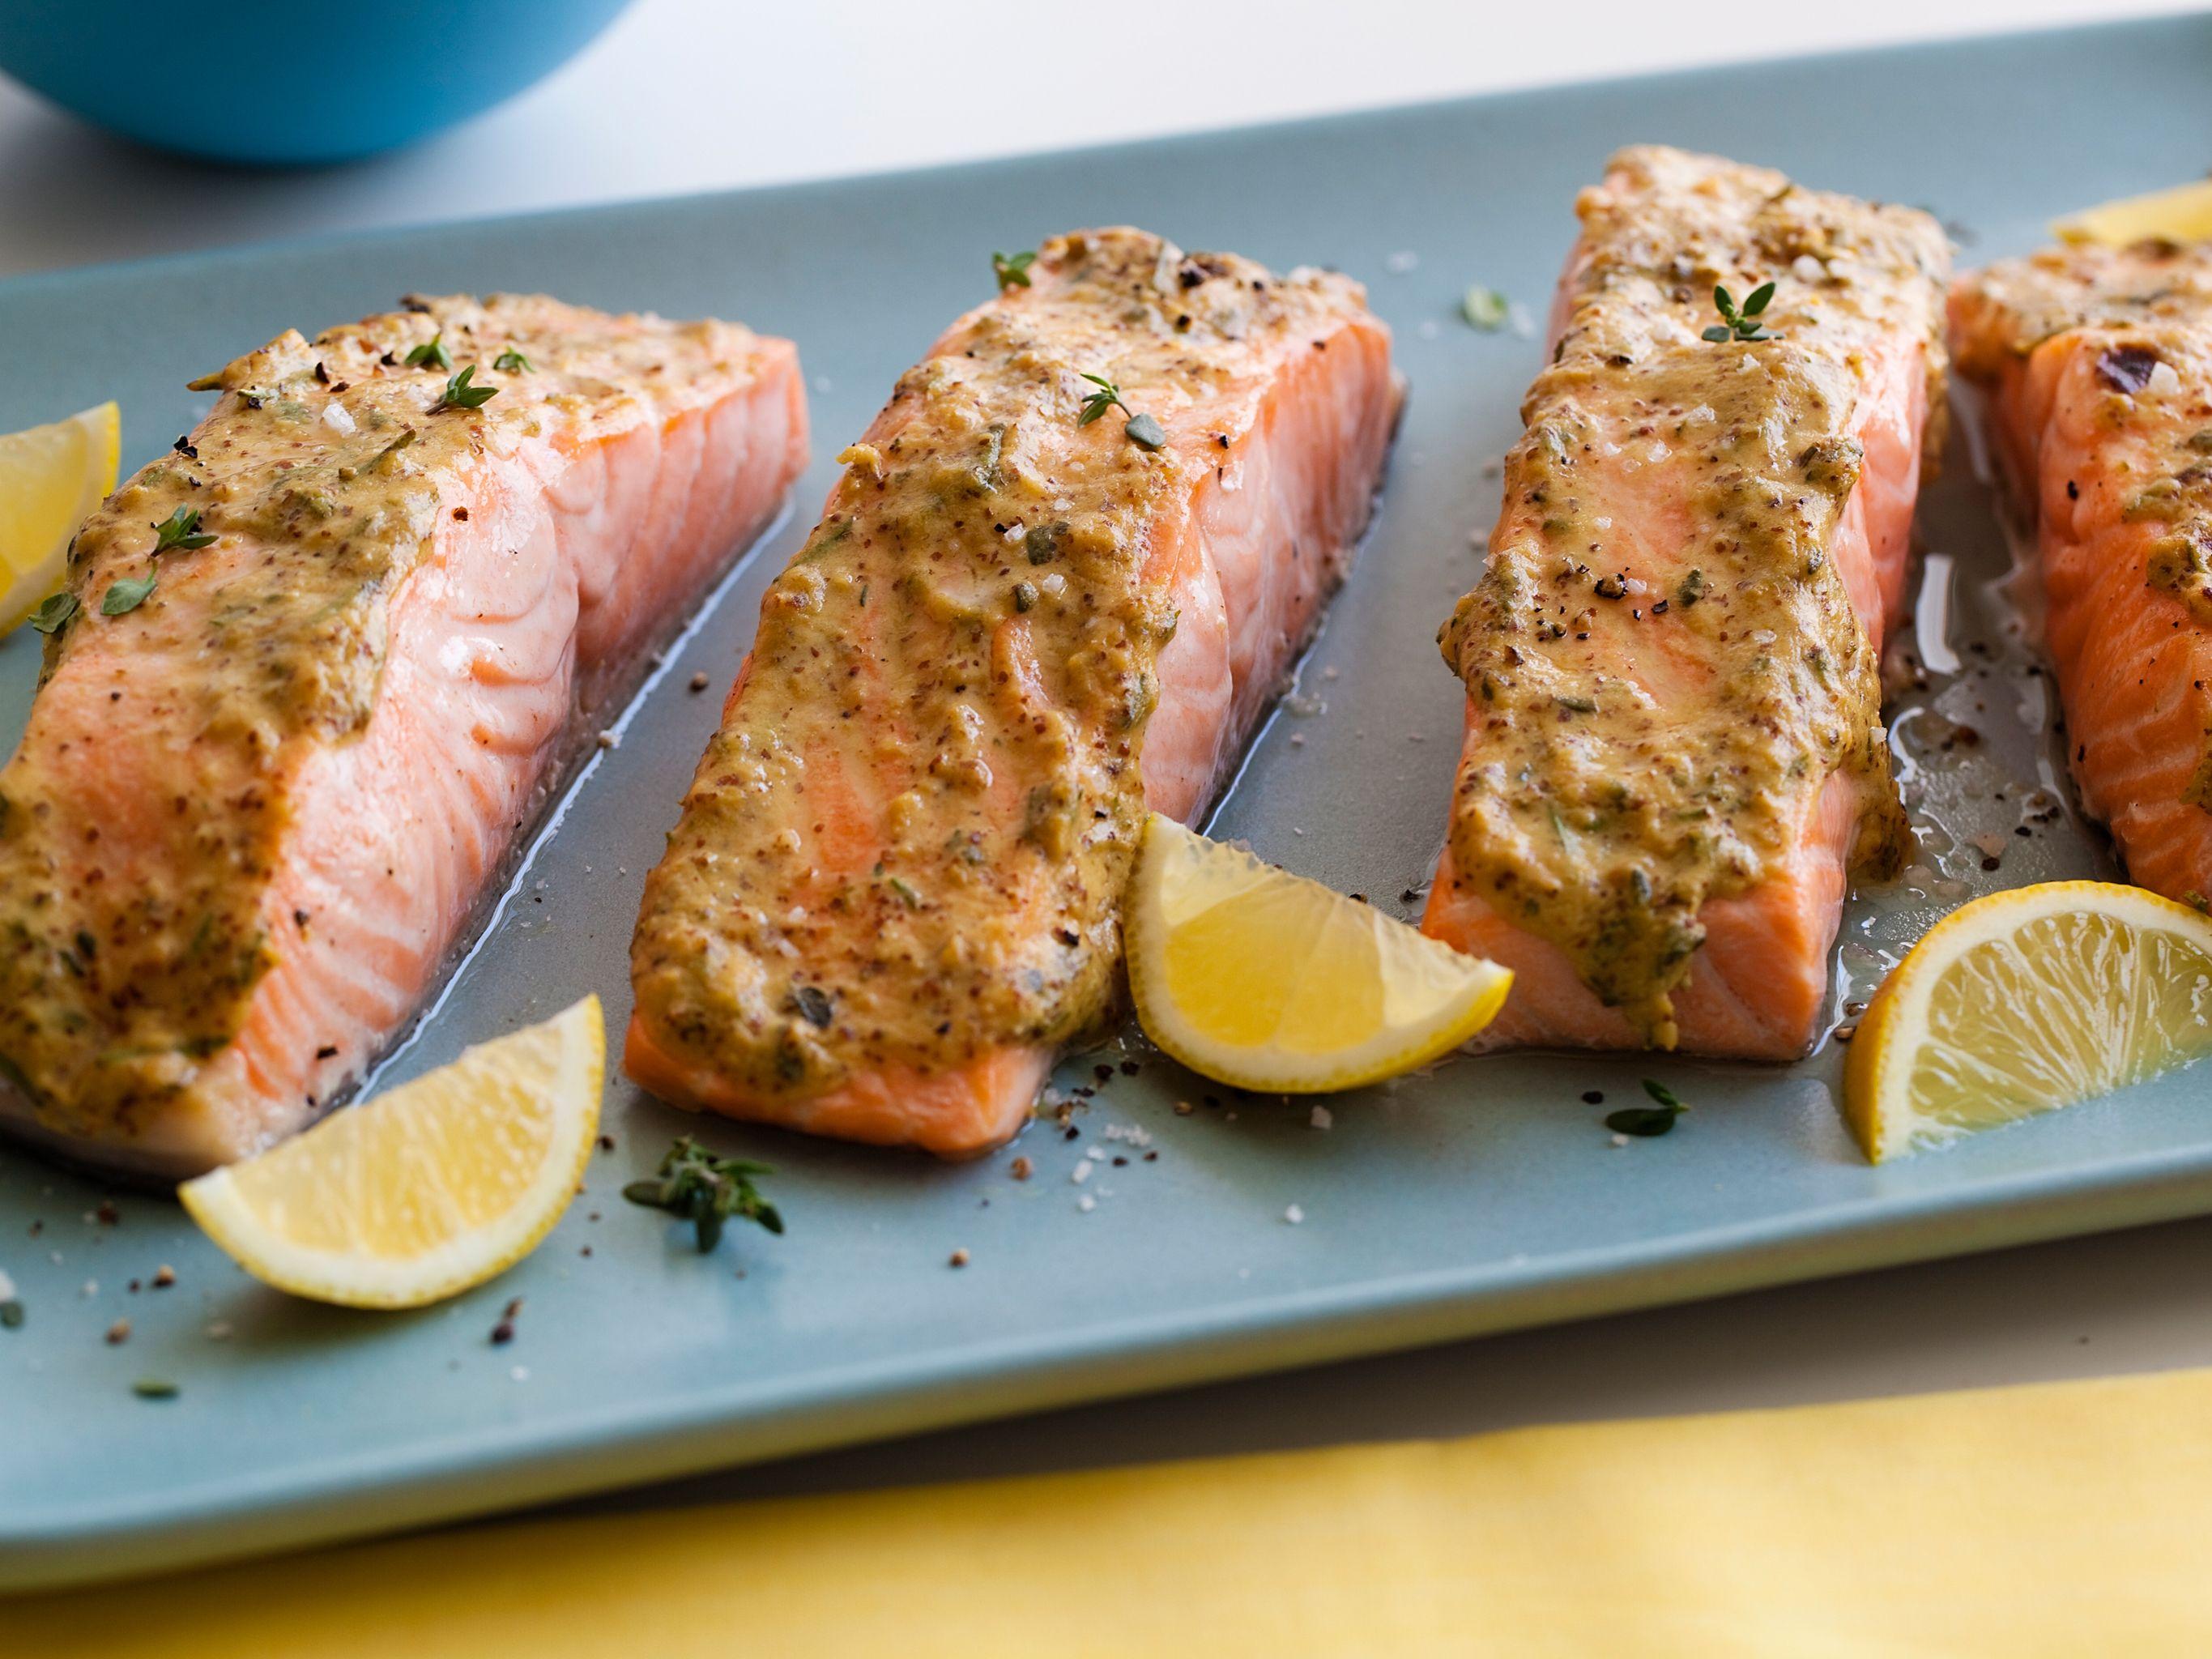 17 Best Images About Ip Recipes On Pinterest Paleo Spaghetti Honey Mustard  Salmon Honey Mustard Salmon